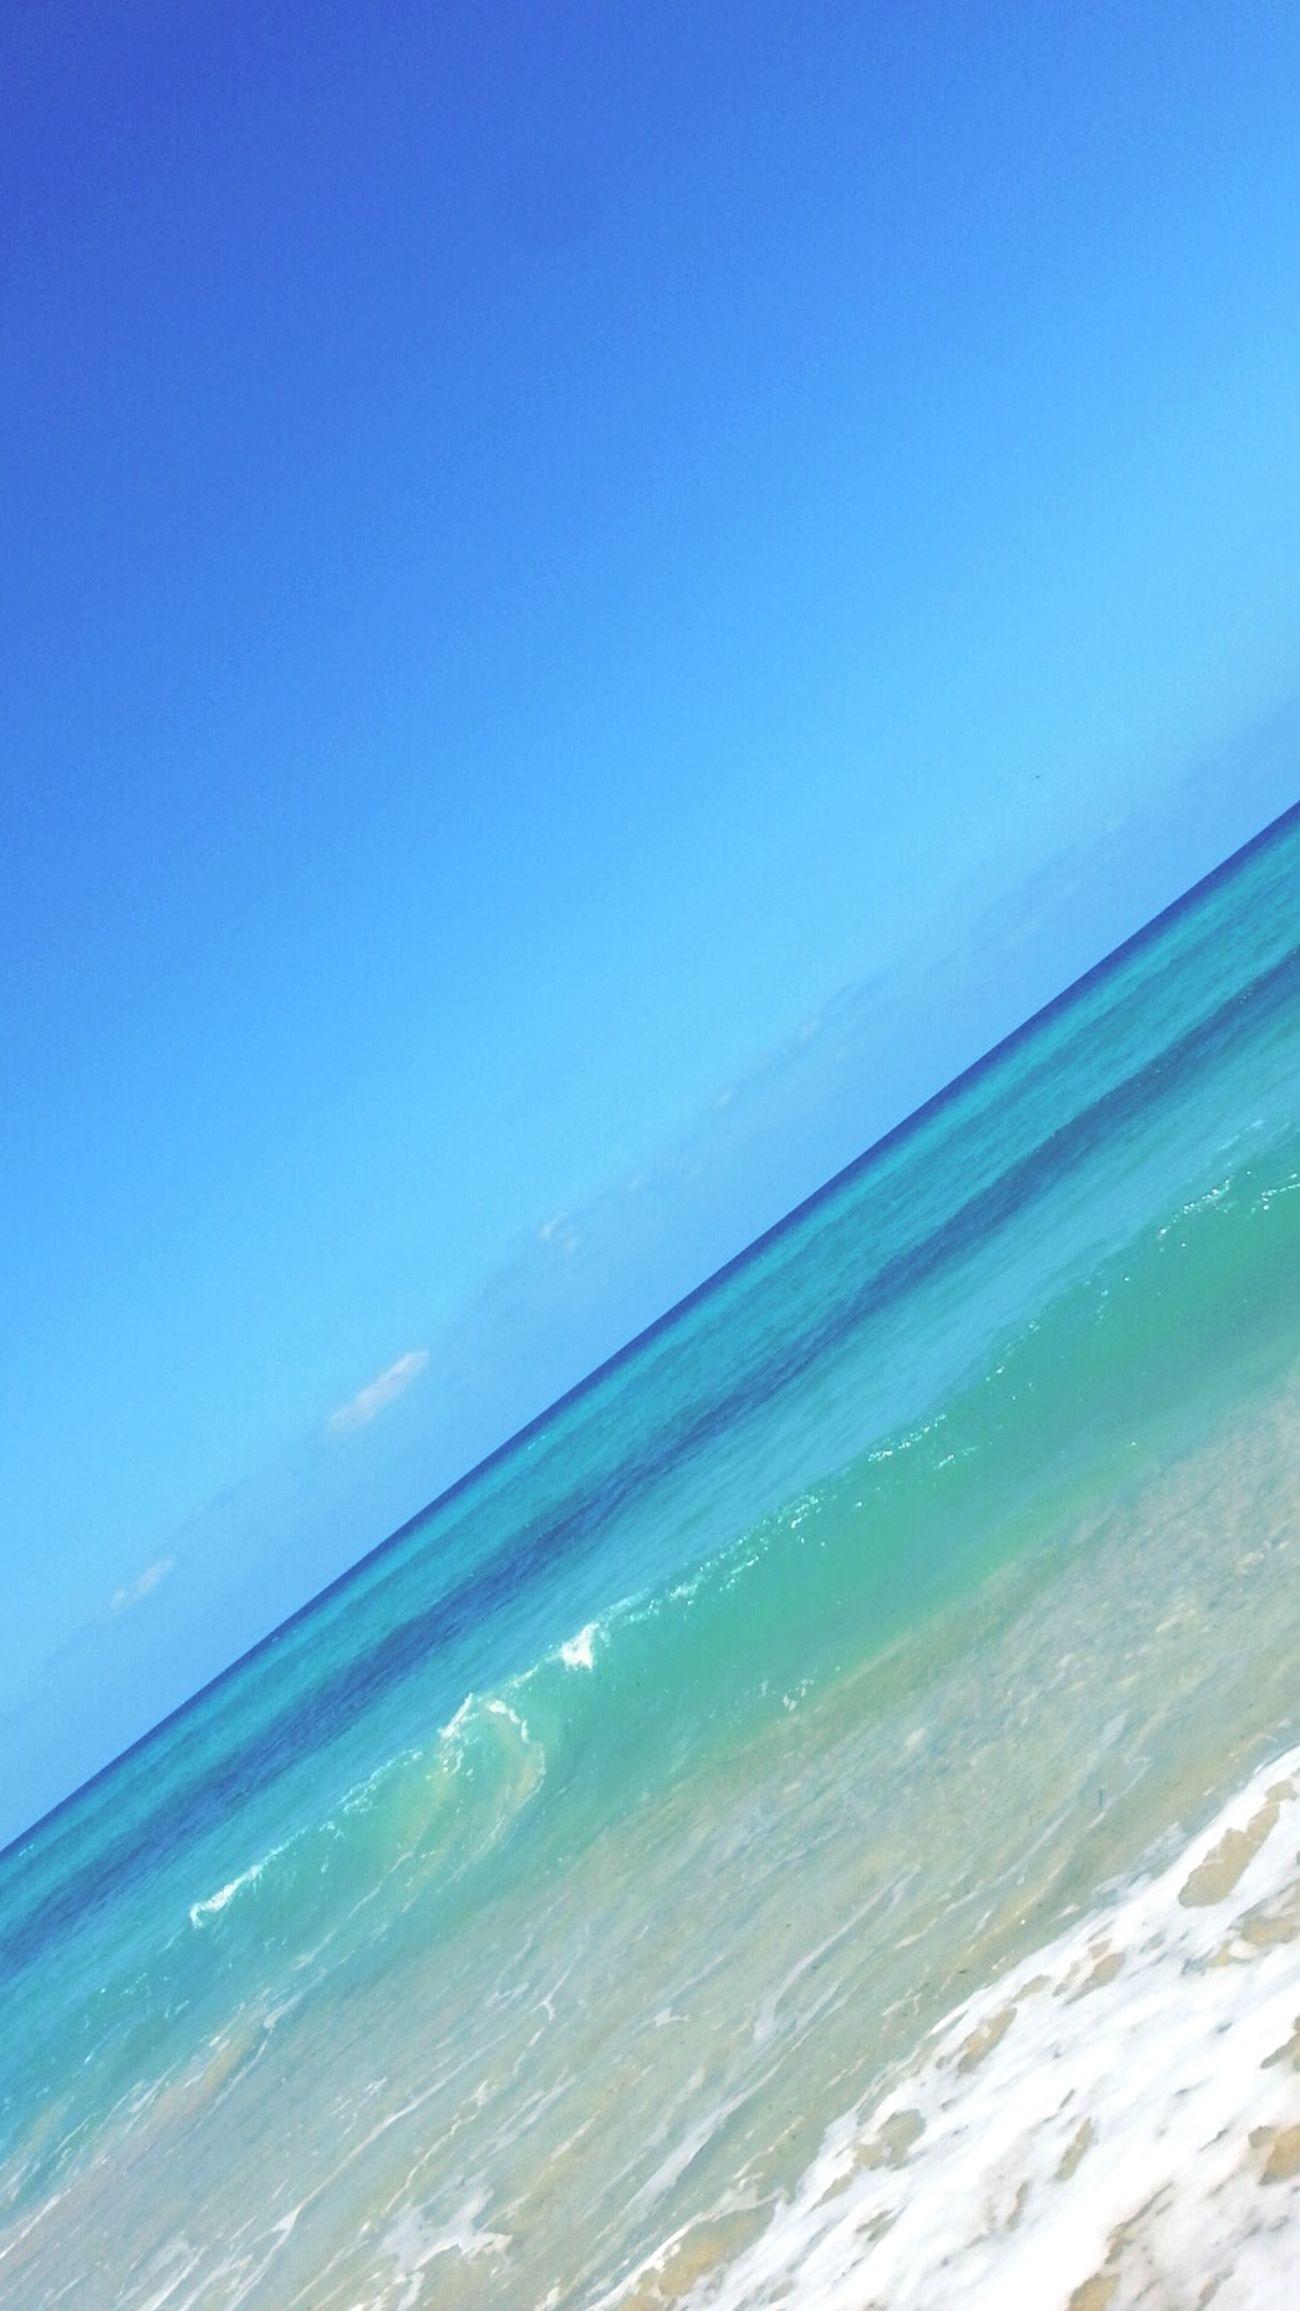 Libya Banghzi Samurai Sky Sun Sea See What I See Libya ✌❤ Memories ❤ 😚